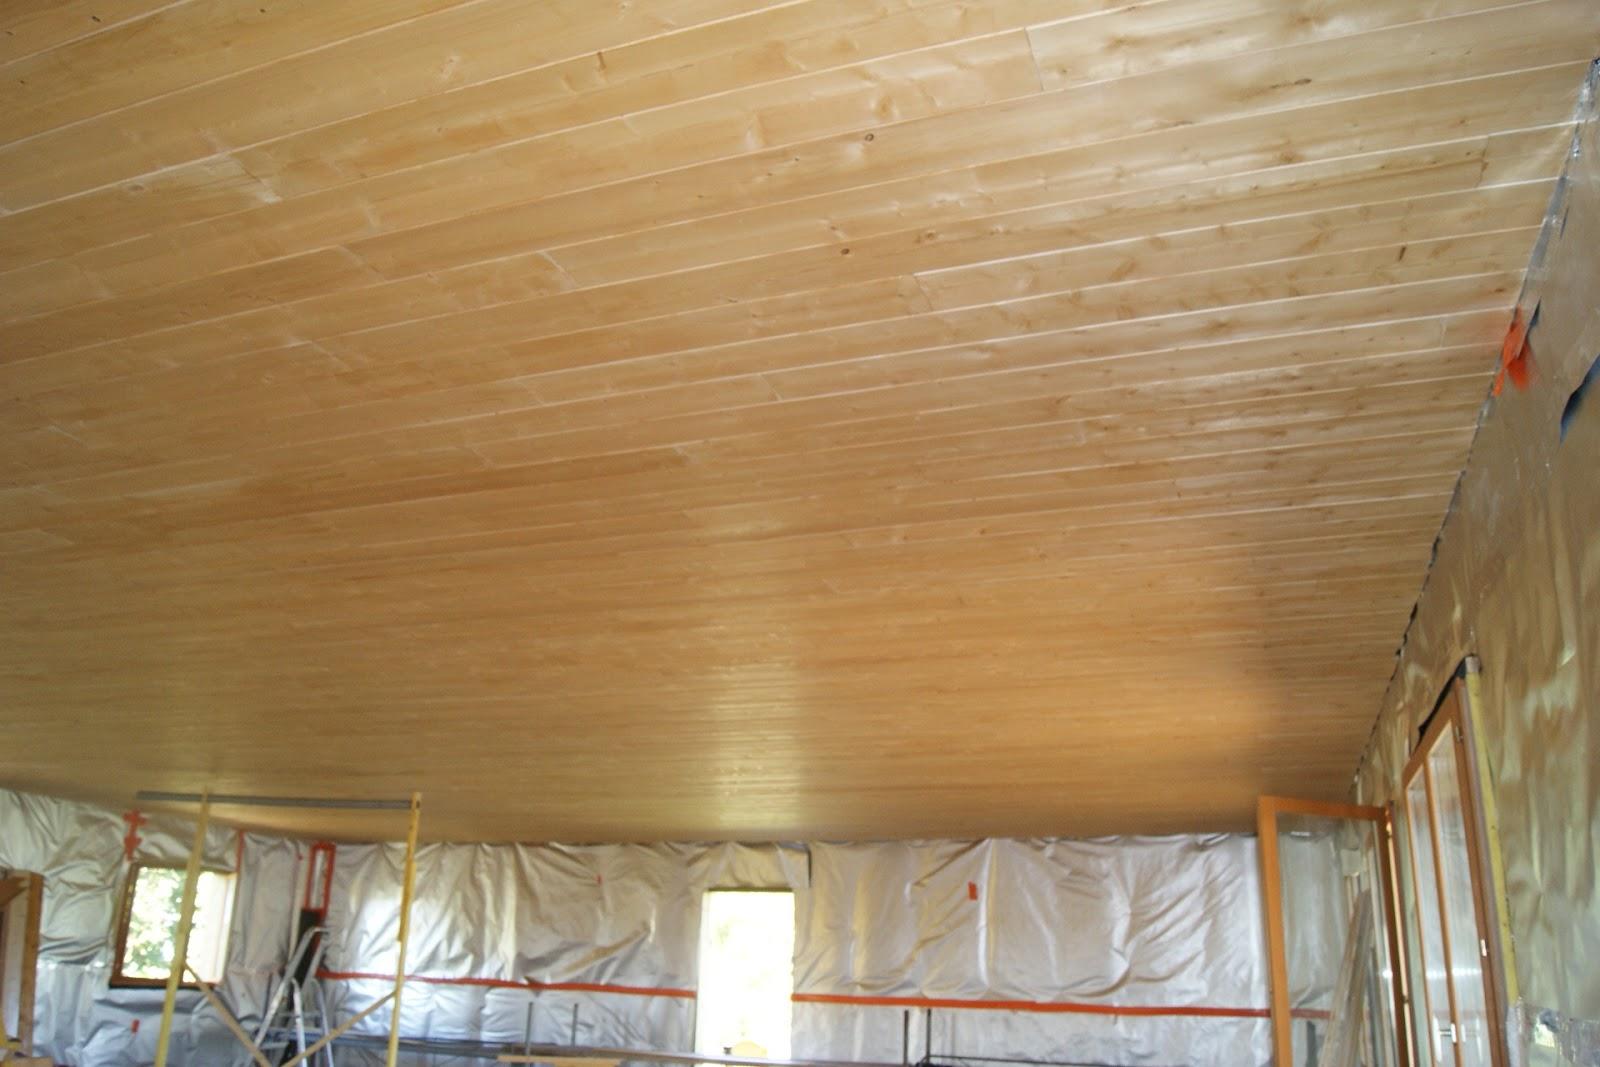 castorama lambris pvc plafond id e inspirante pour la conception de la maison. Black Bedroom Furniture Sets. Home Design Ideas